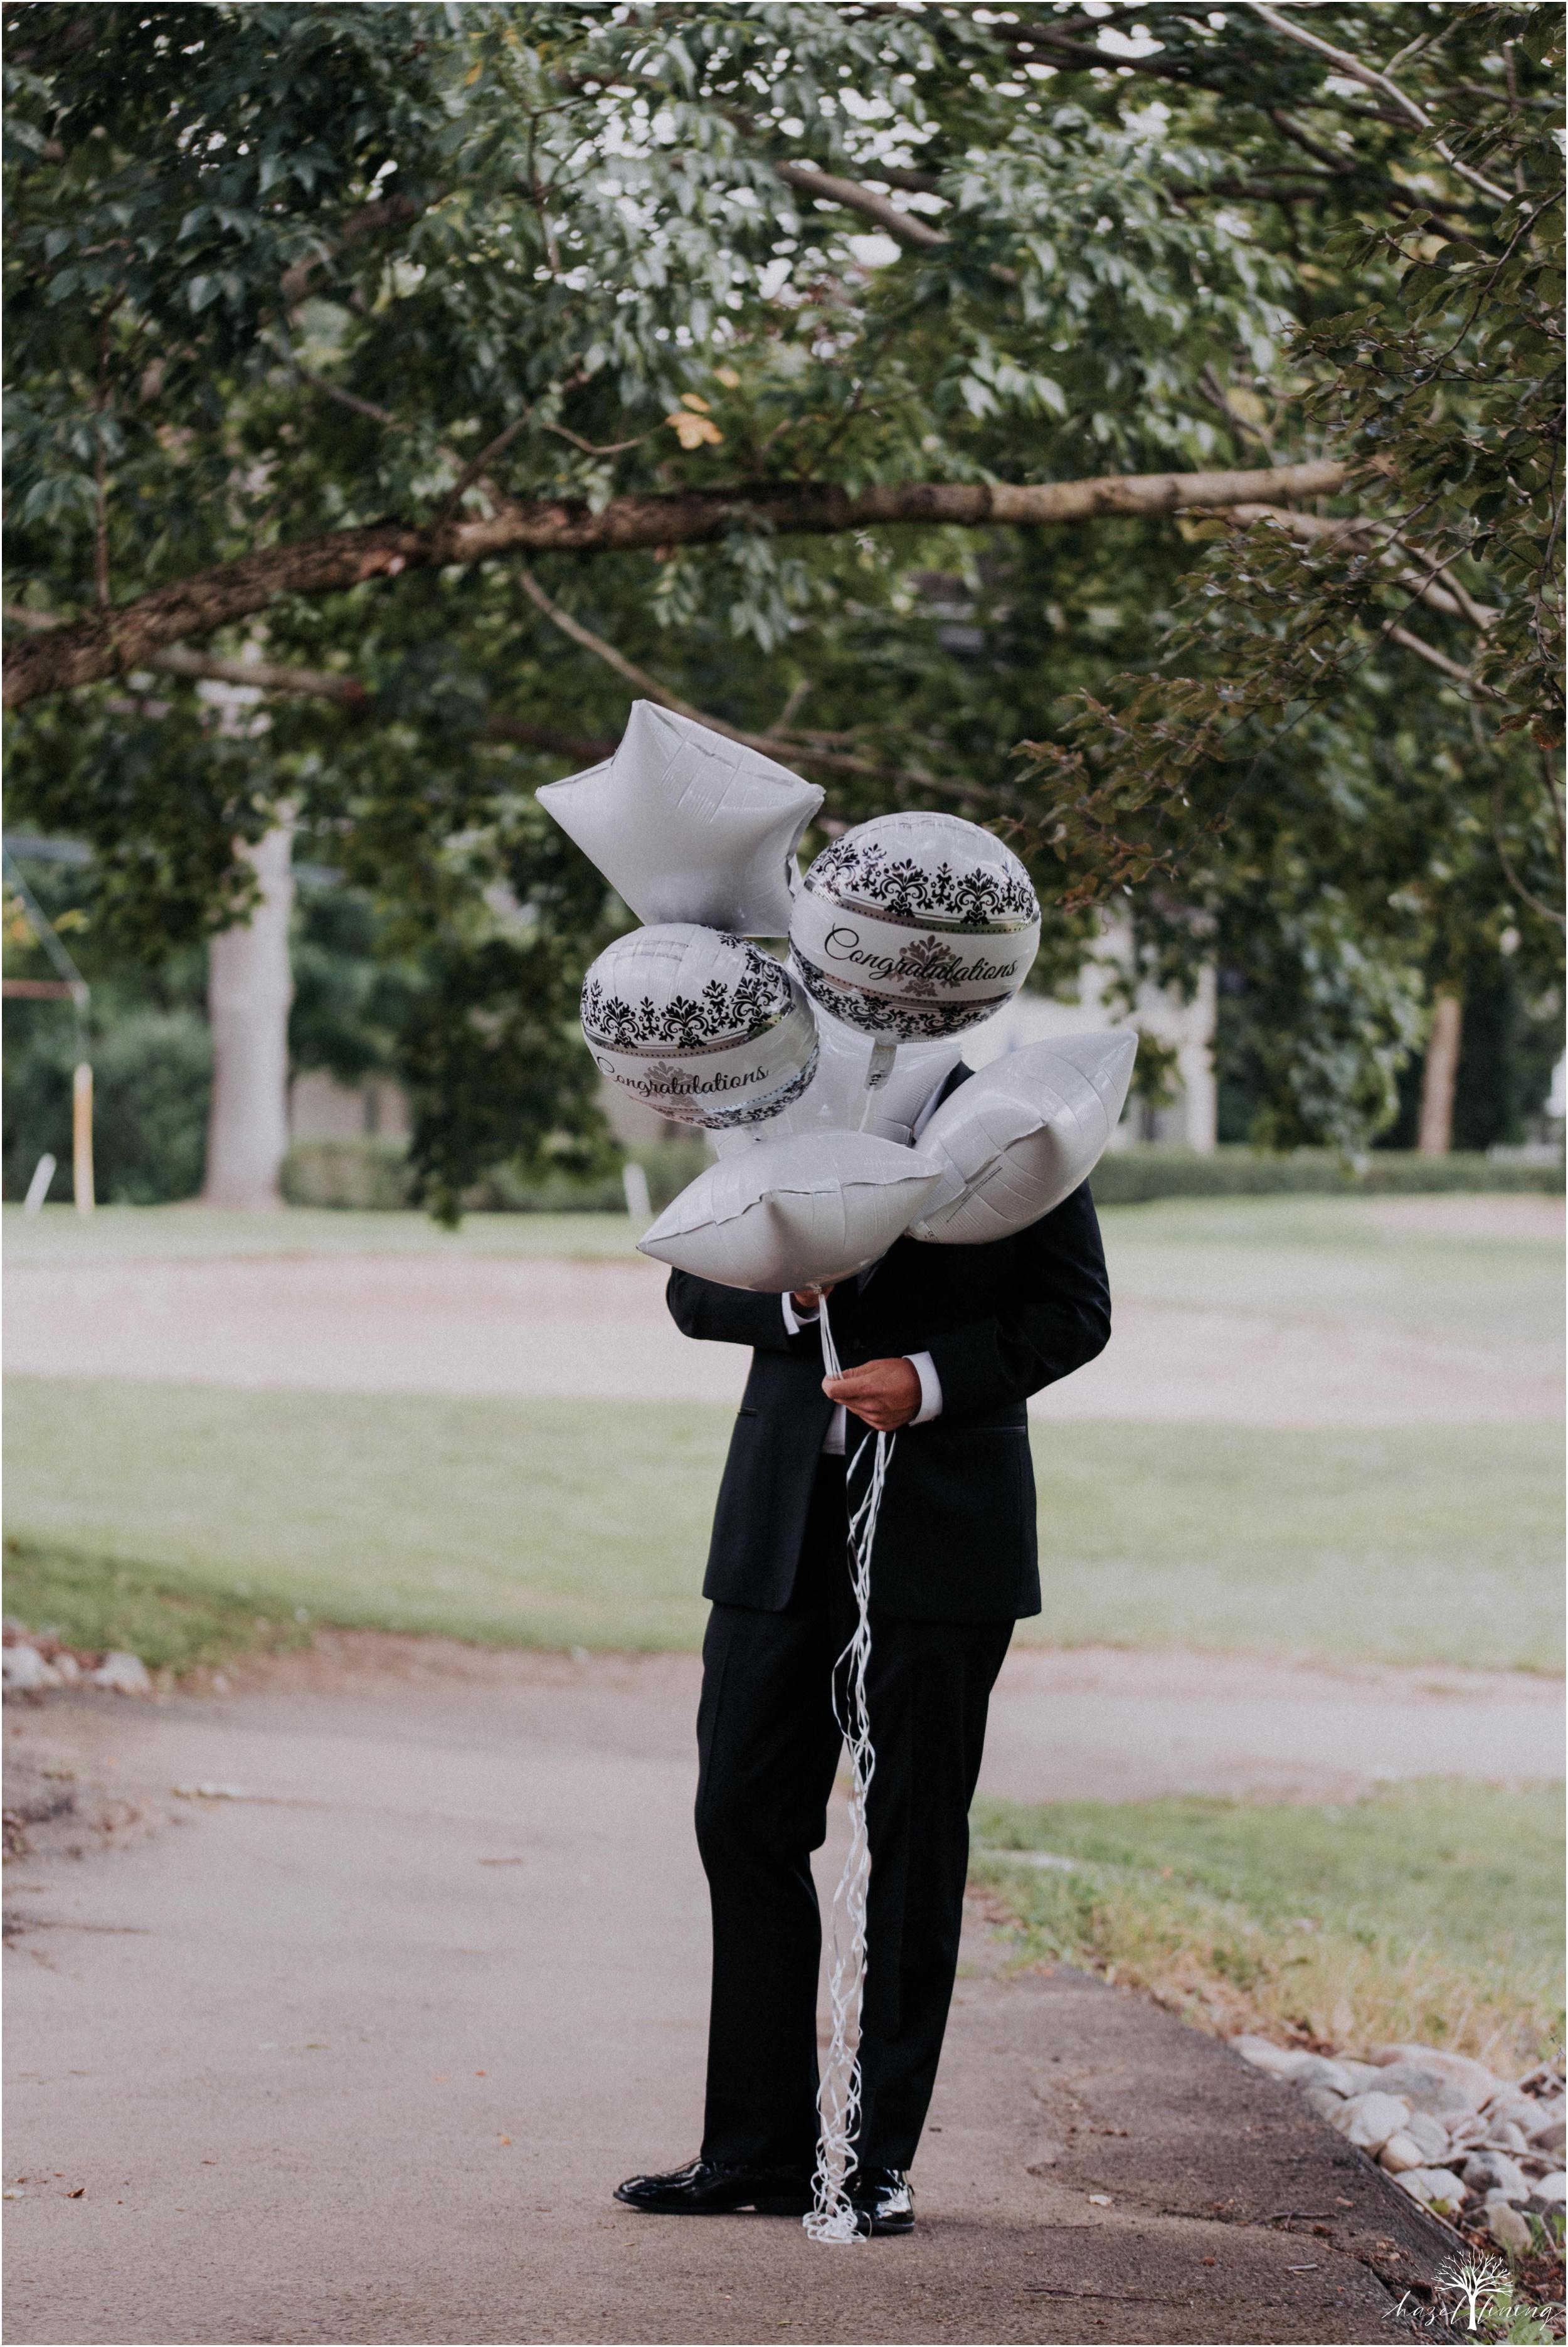 elizabeth-doelp-andrew-foreback-middletown-country-club-summer-langhorne-pennsylvania-wedding-hazel-lining-travel-wedding-elopement-photography_0028.jpg